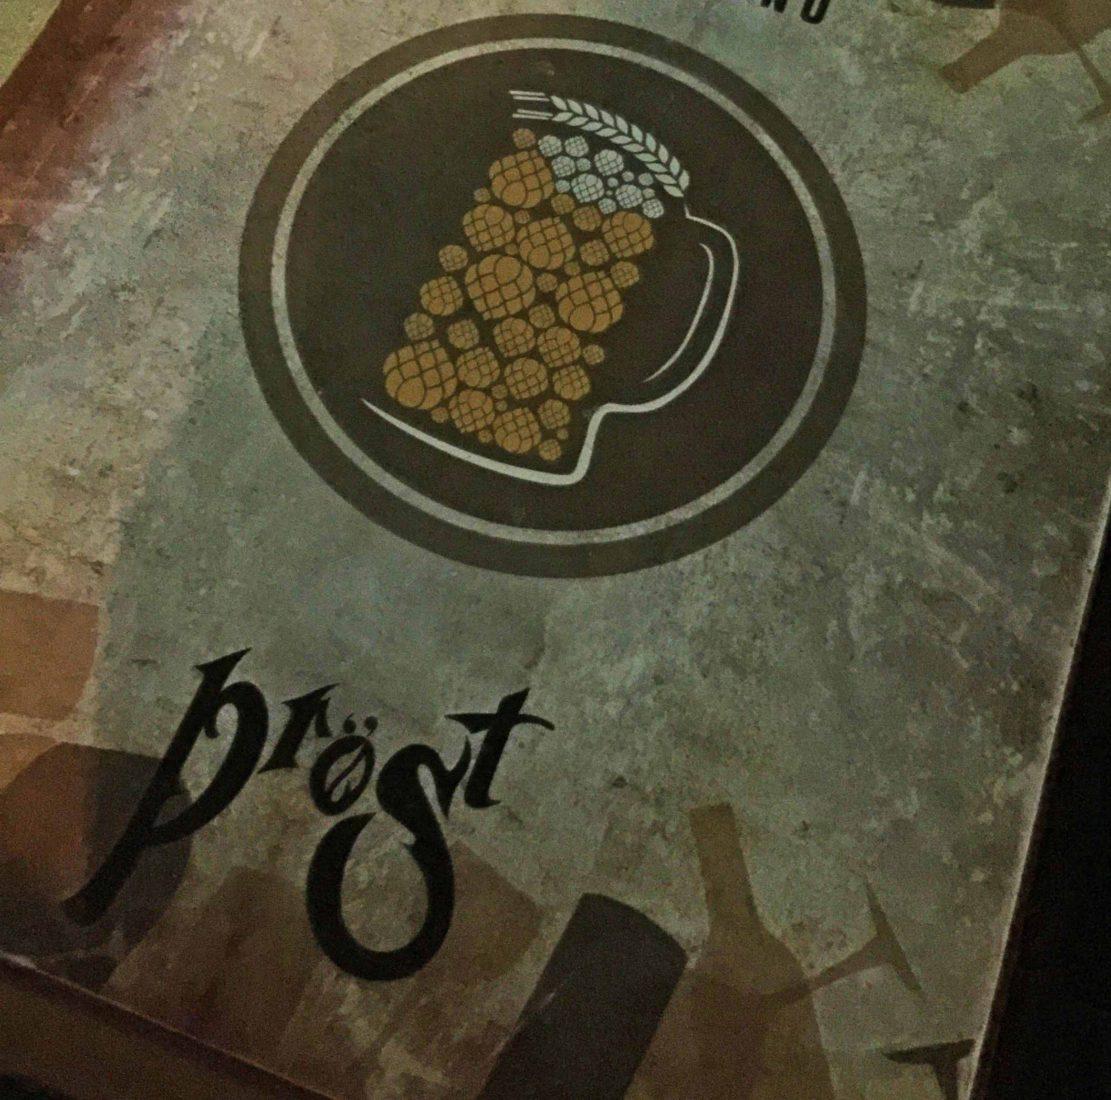 254. Prost Brewery, Bangalore India, 2015